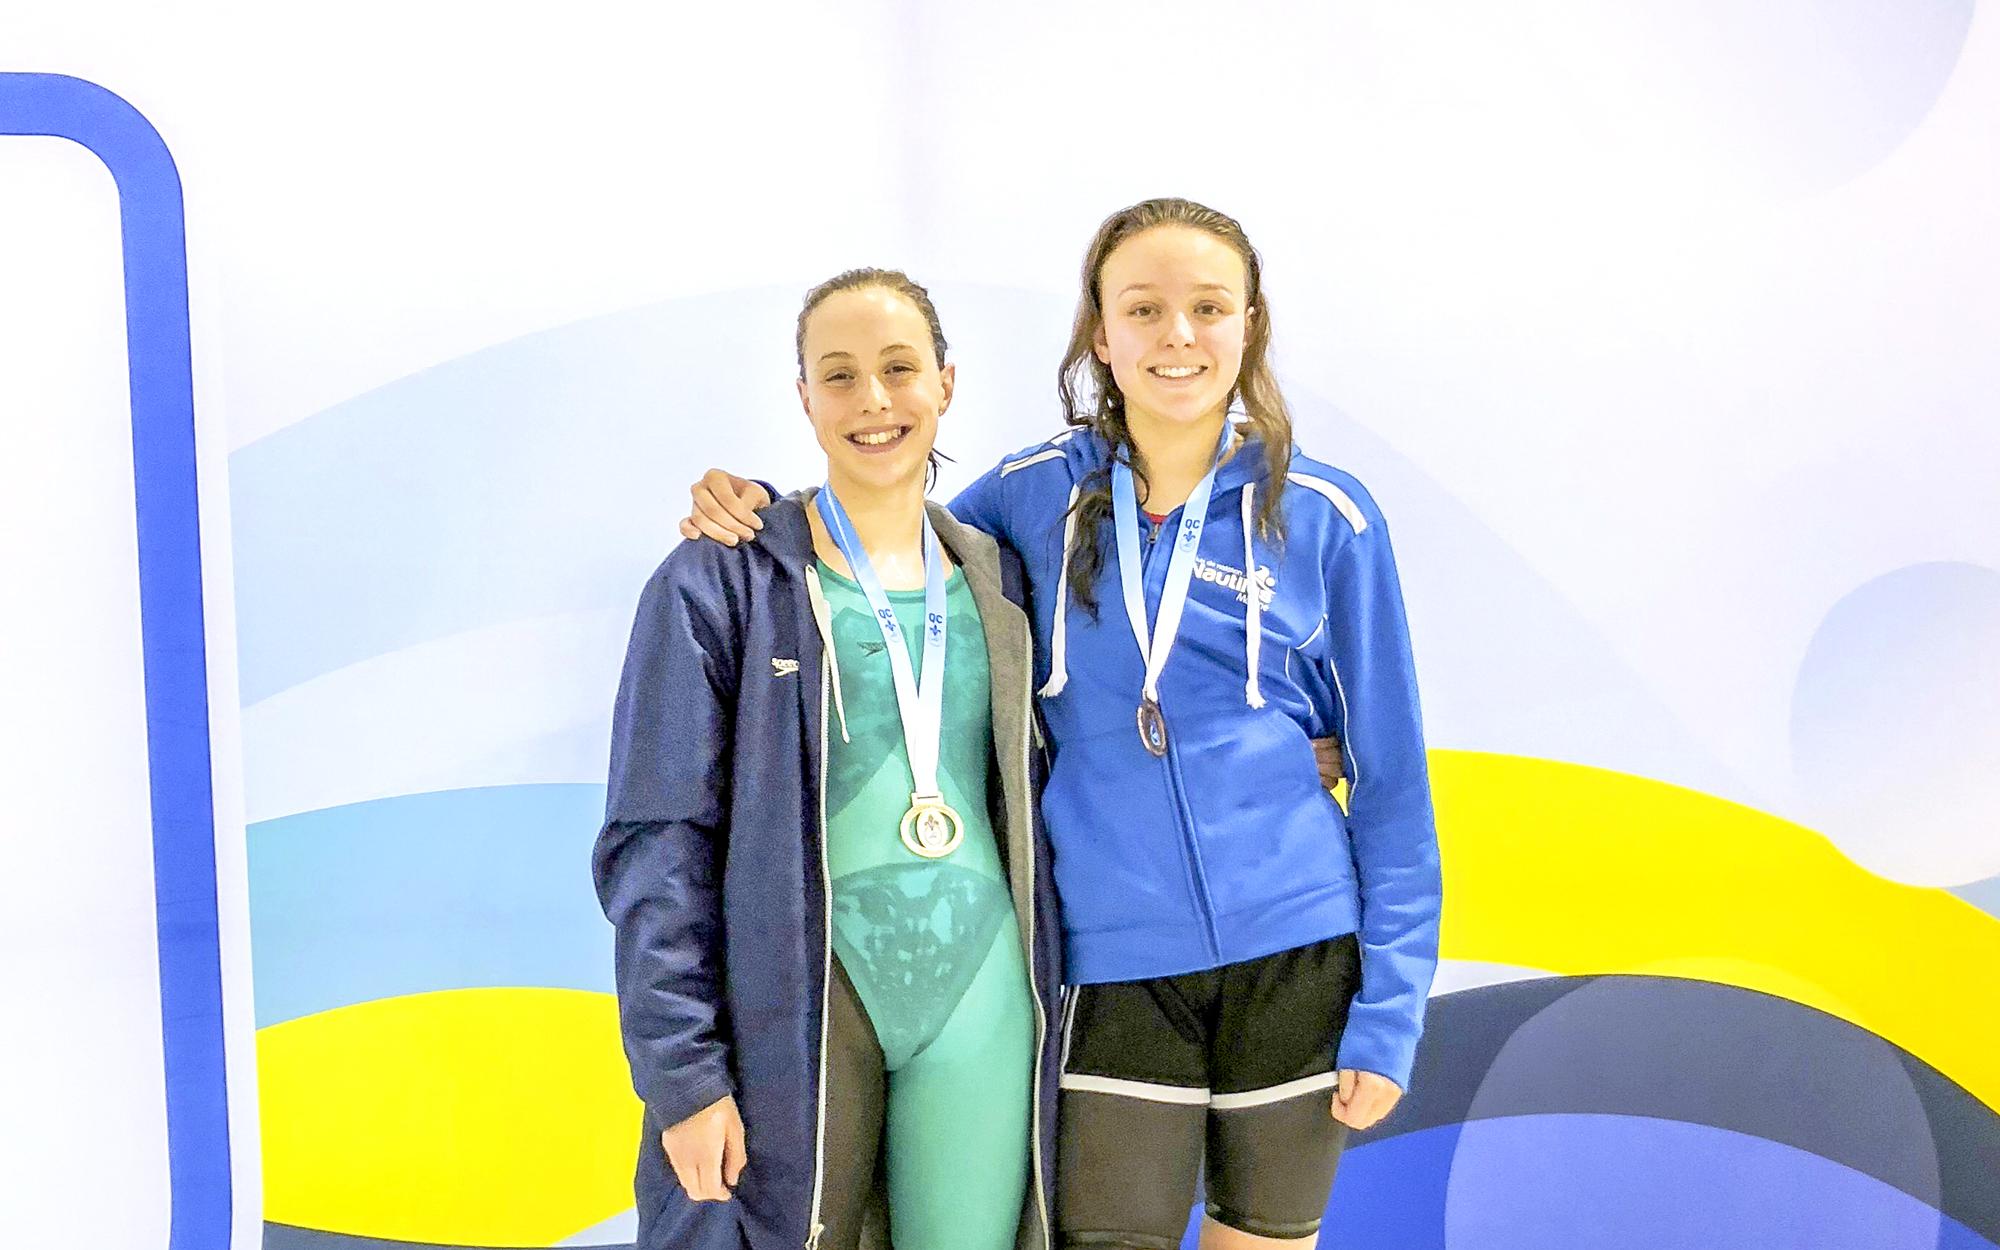 Sandy Tremblay Nautilus de Matane natation